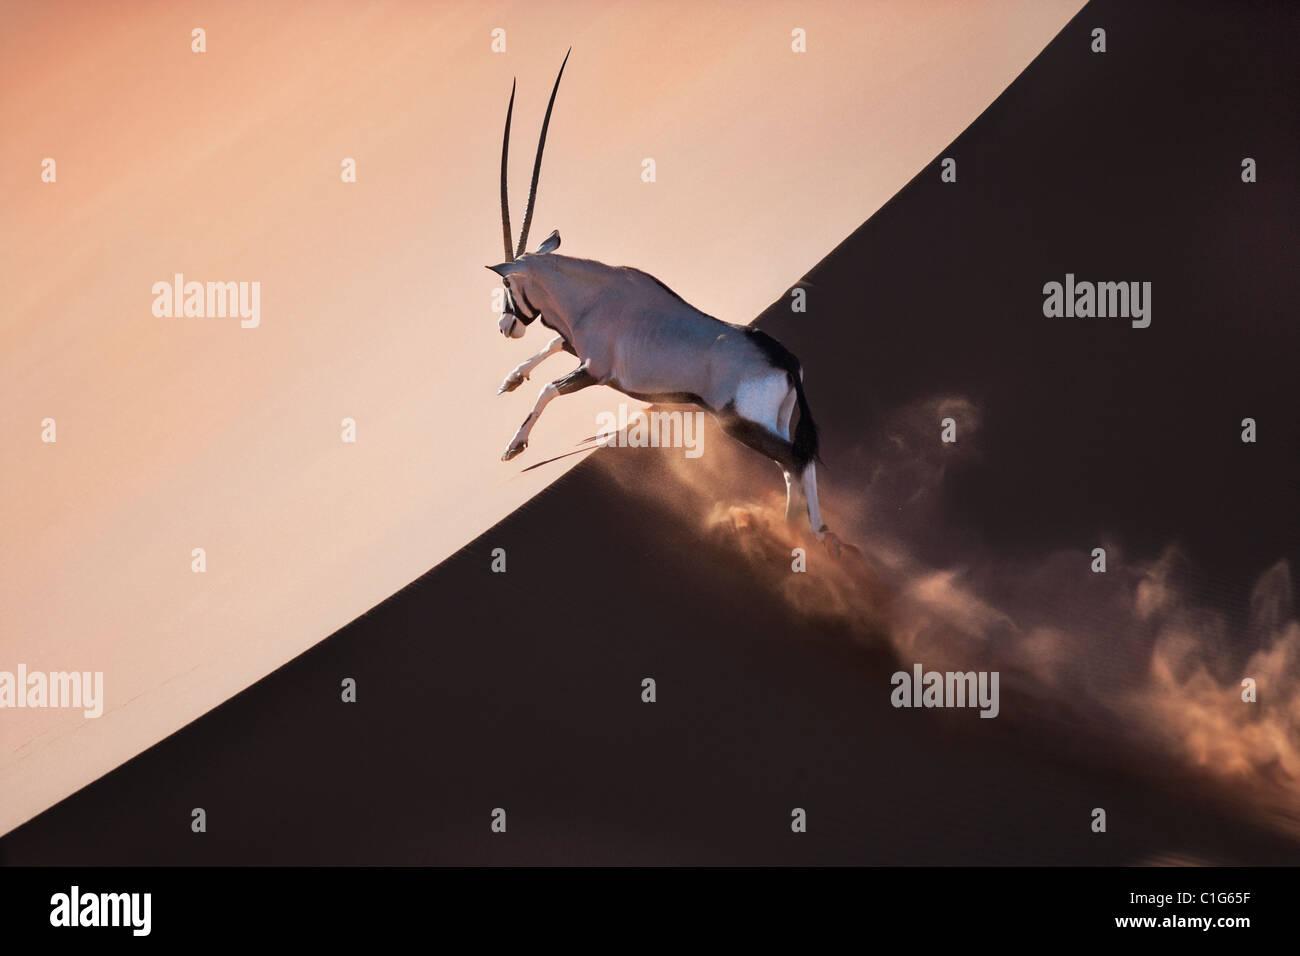 Gemsbok (Oryx gazella) In tipico habitat Deserto Deserto Namibiano dune di sabbia Foto Stock